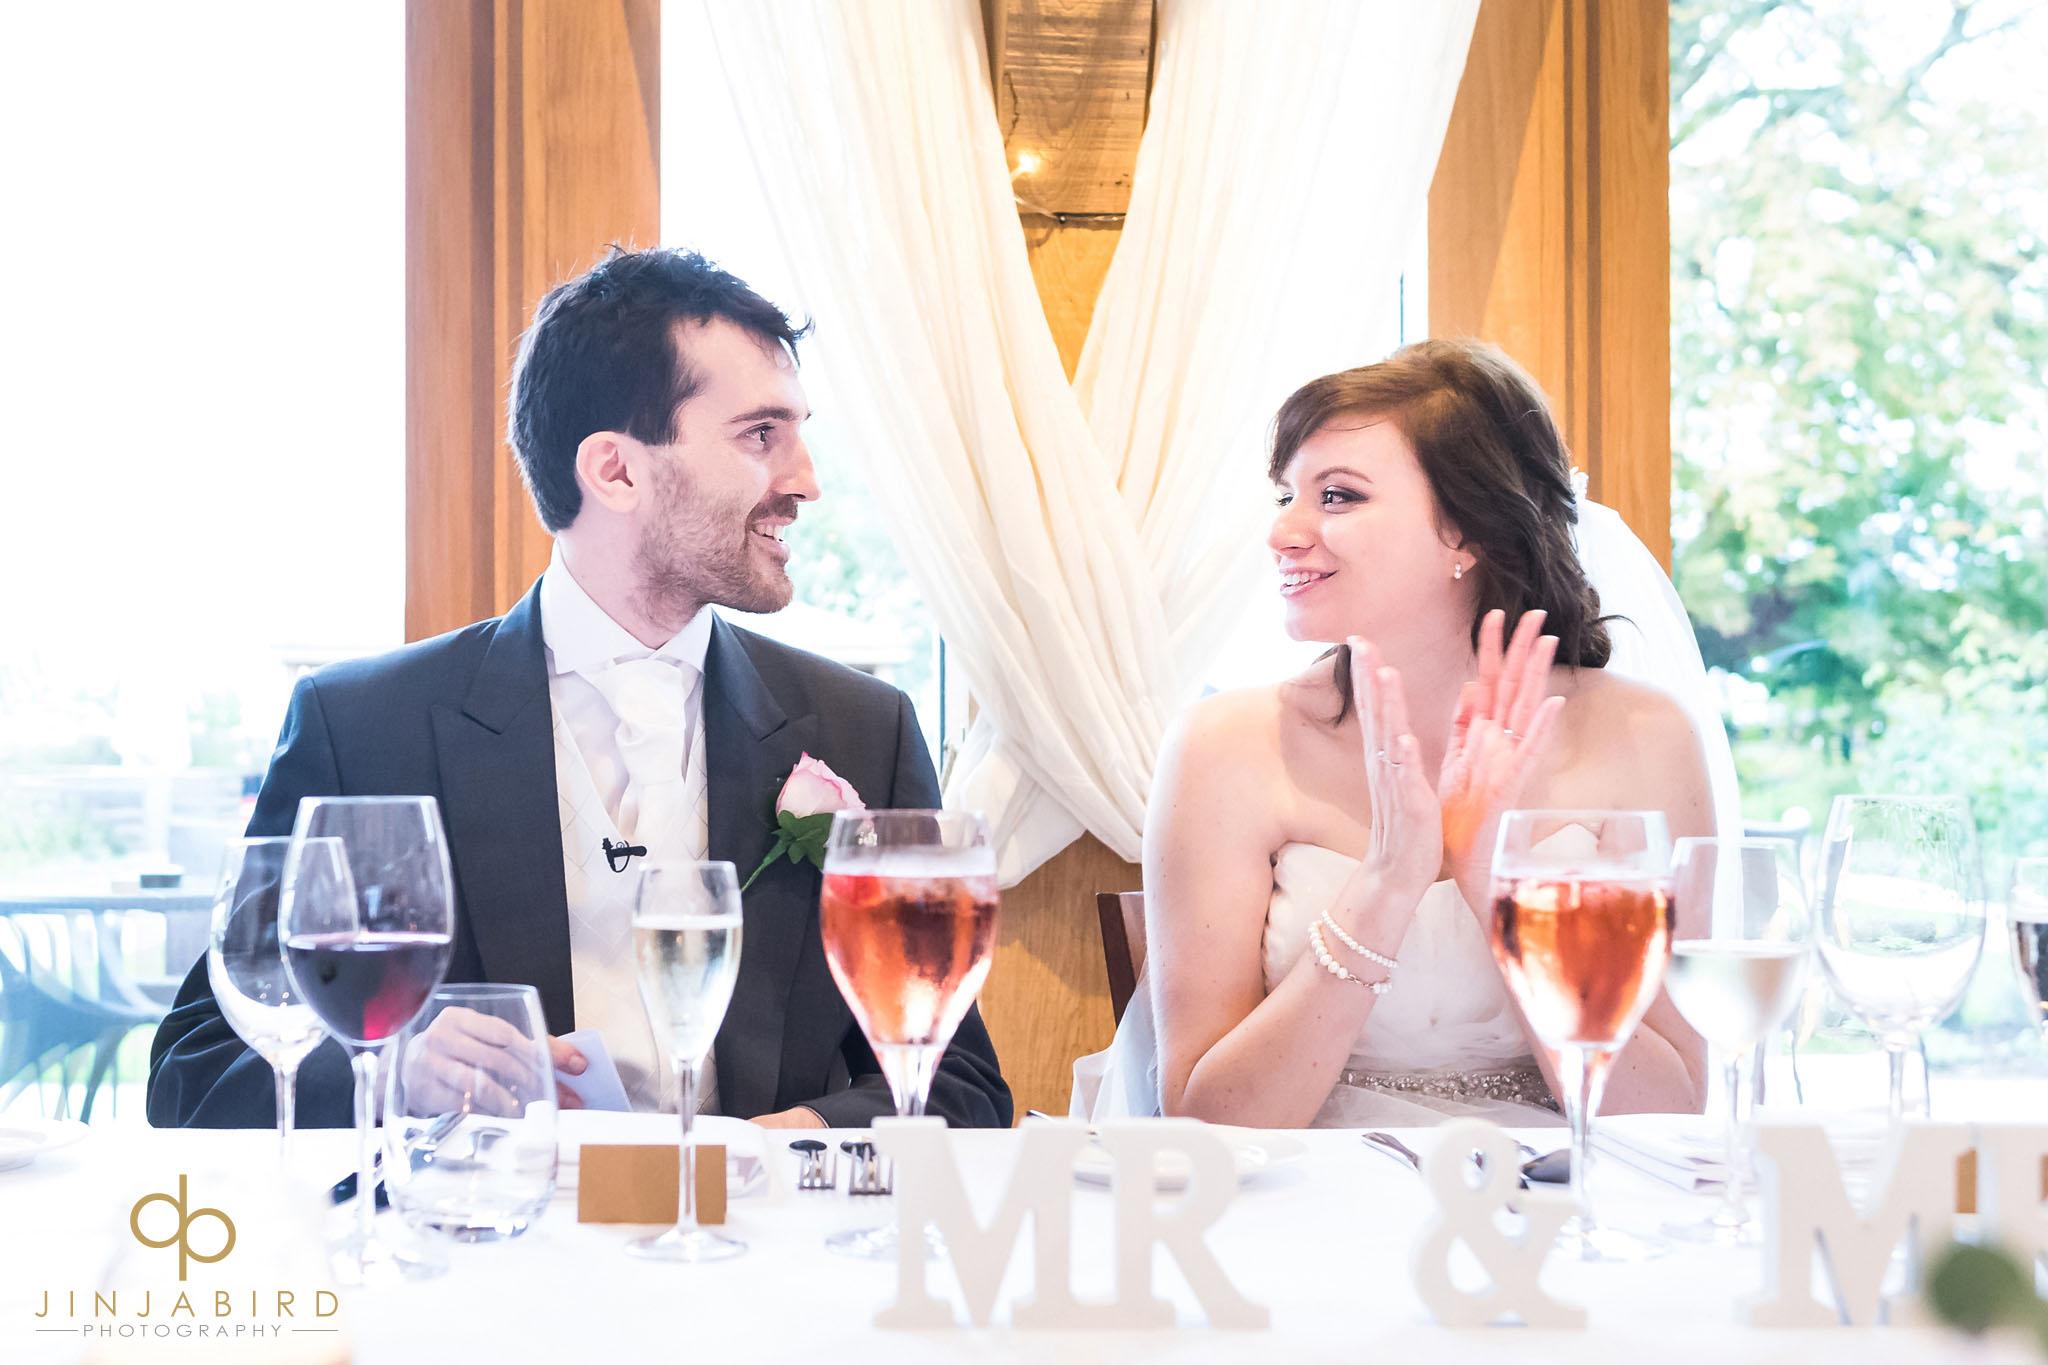 bride and groom at wedding breakfast bassmead manor